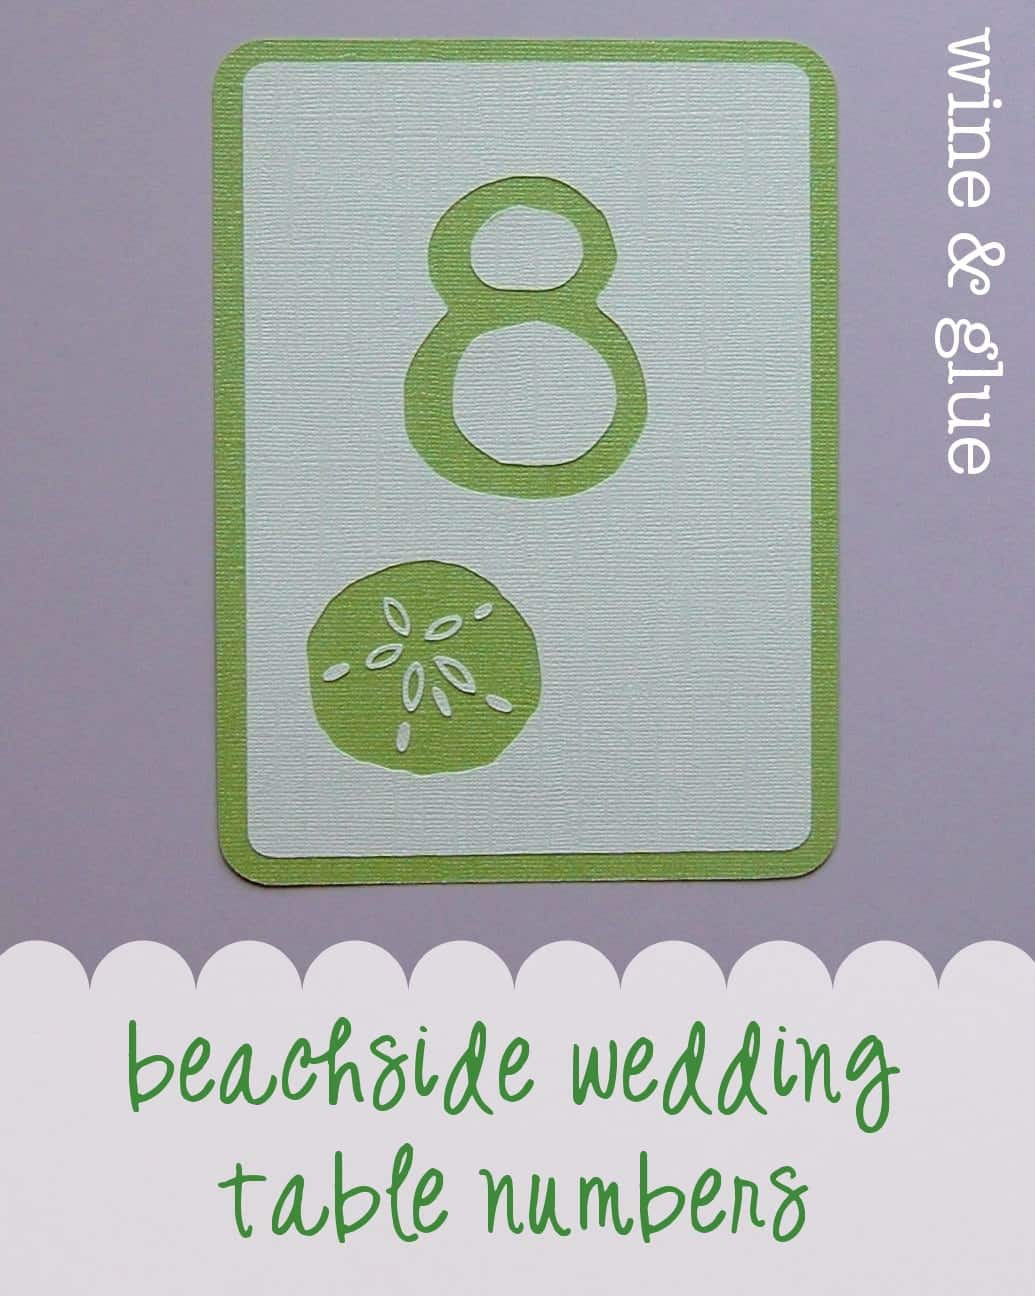 Beachside Wedding Table Numbers